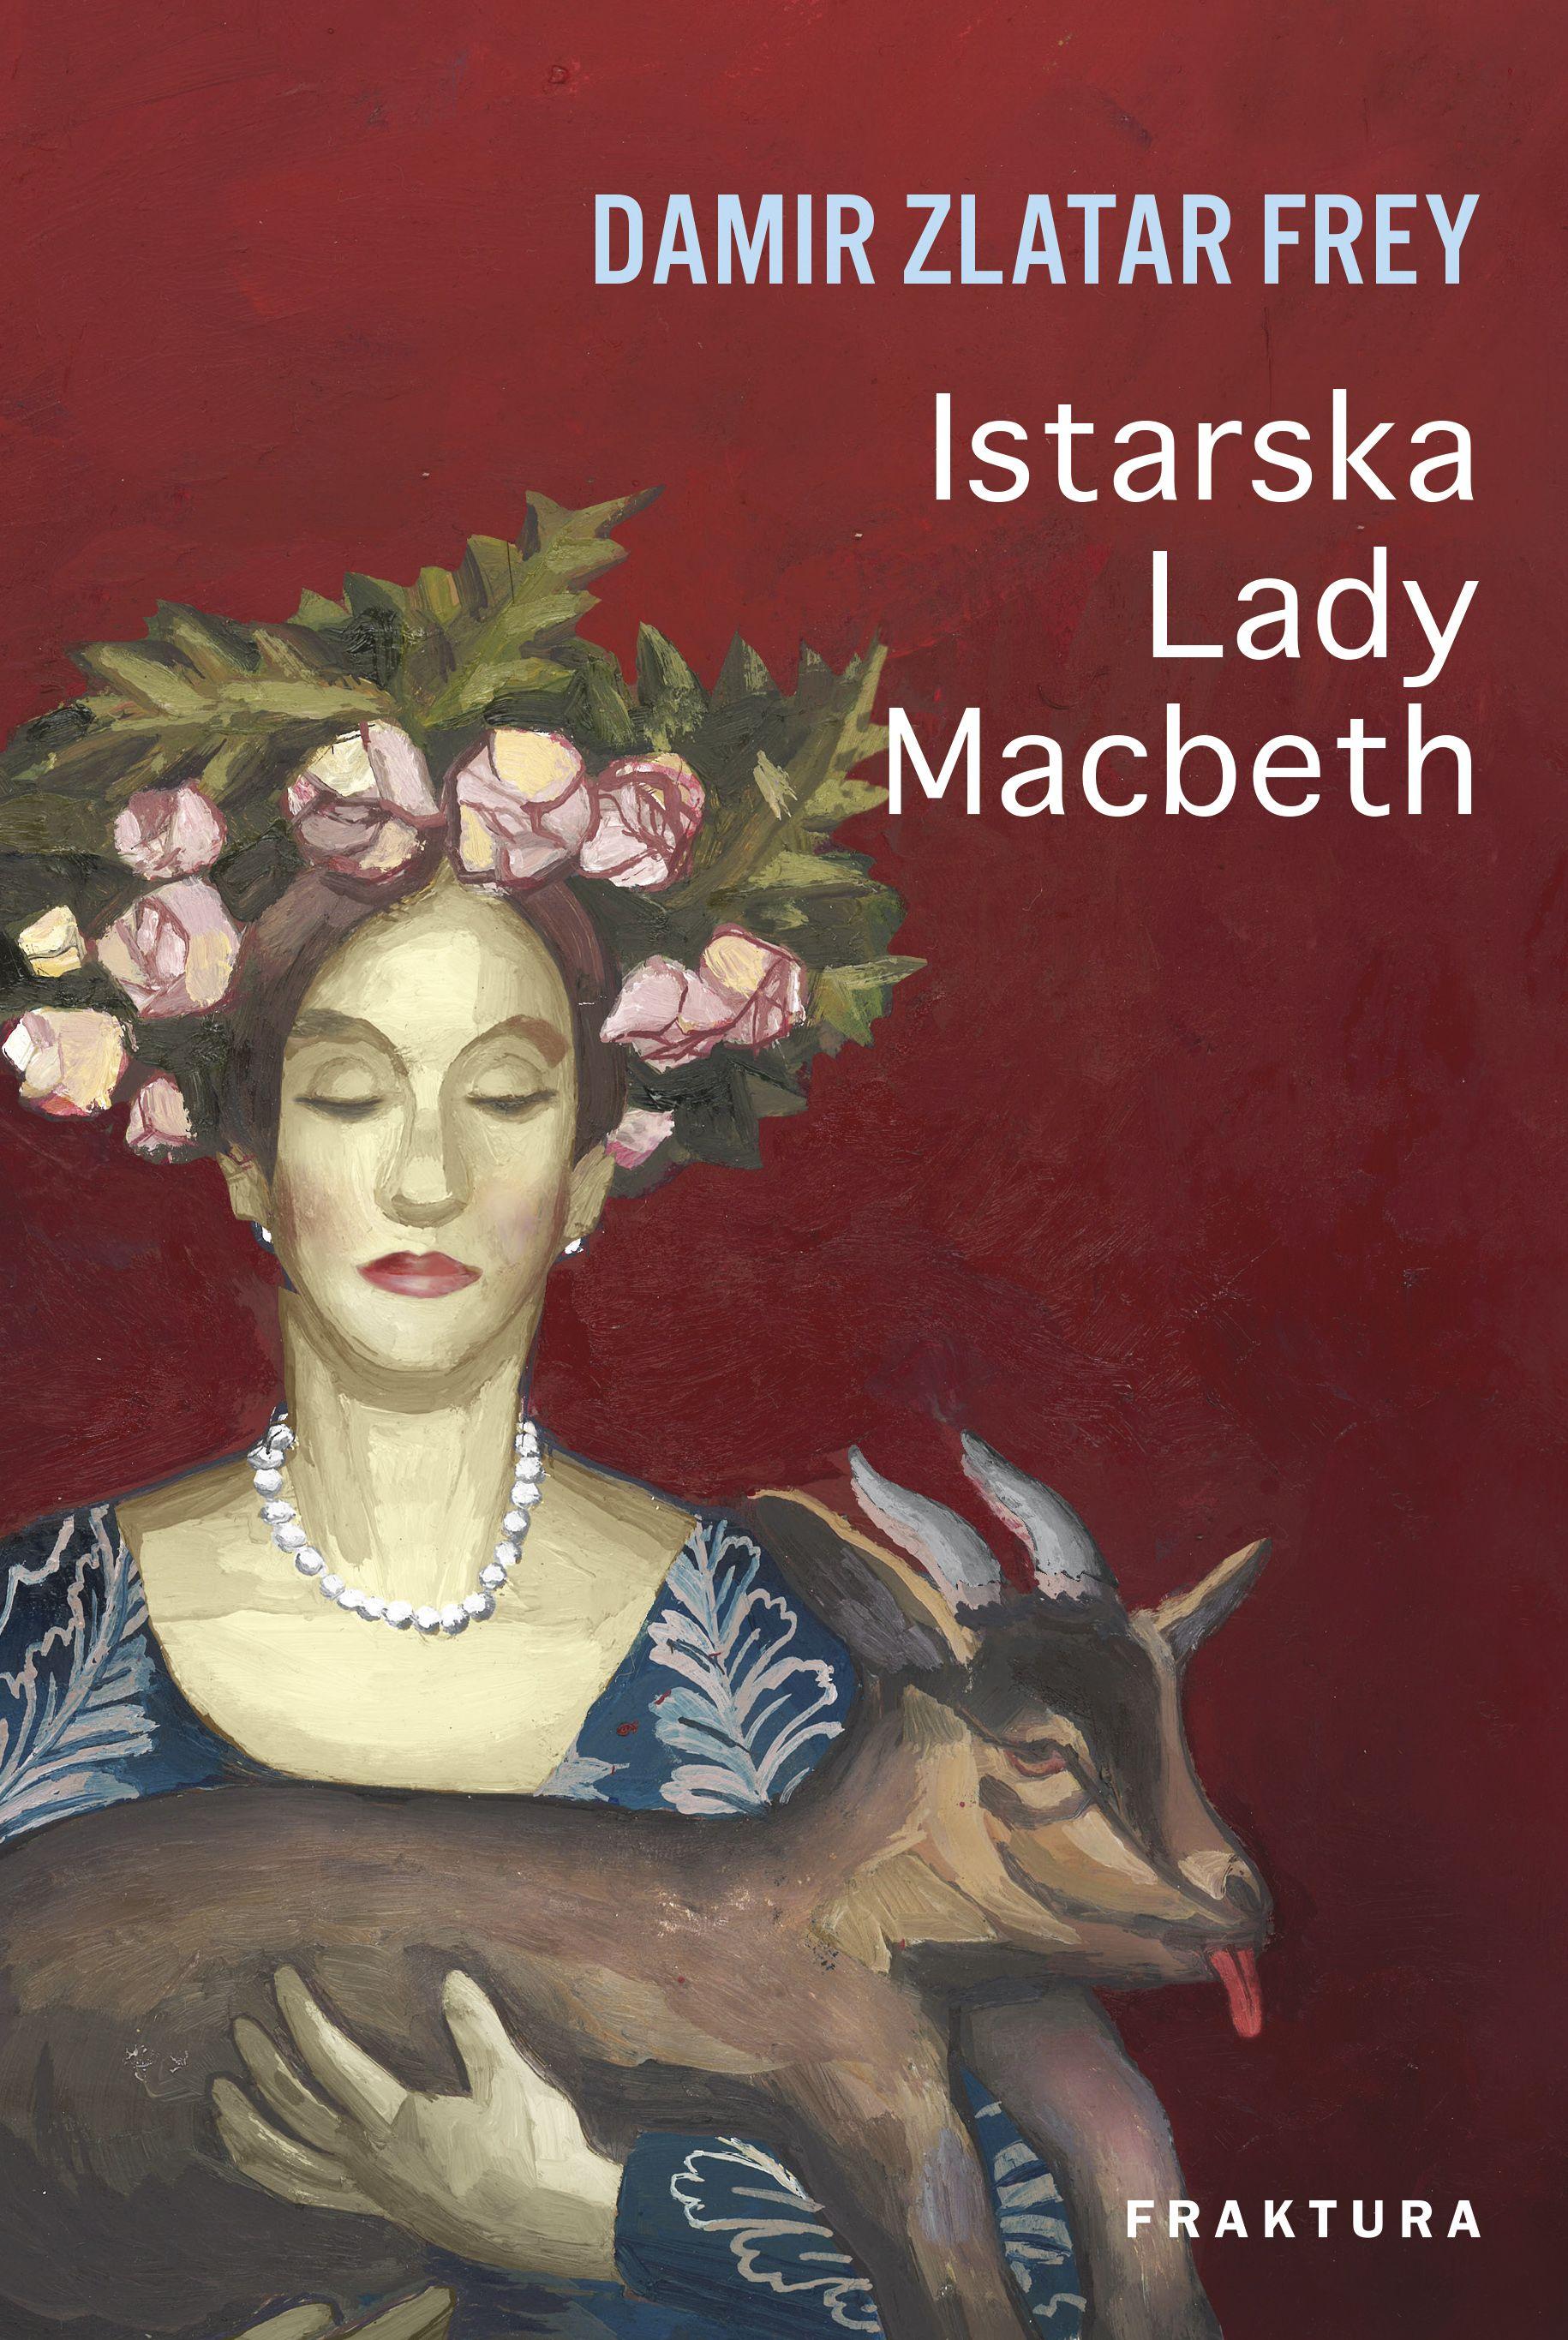 Večeras – Predstavljanje knjige 'Istarska Lady Macbeth' Damira Zlatara Freya, i ostale promocije